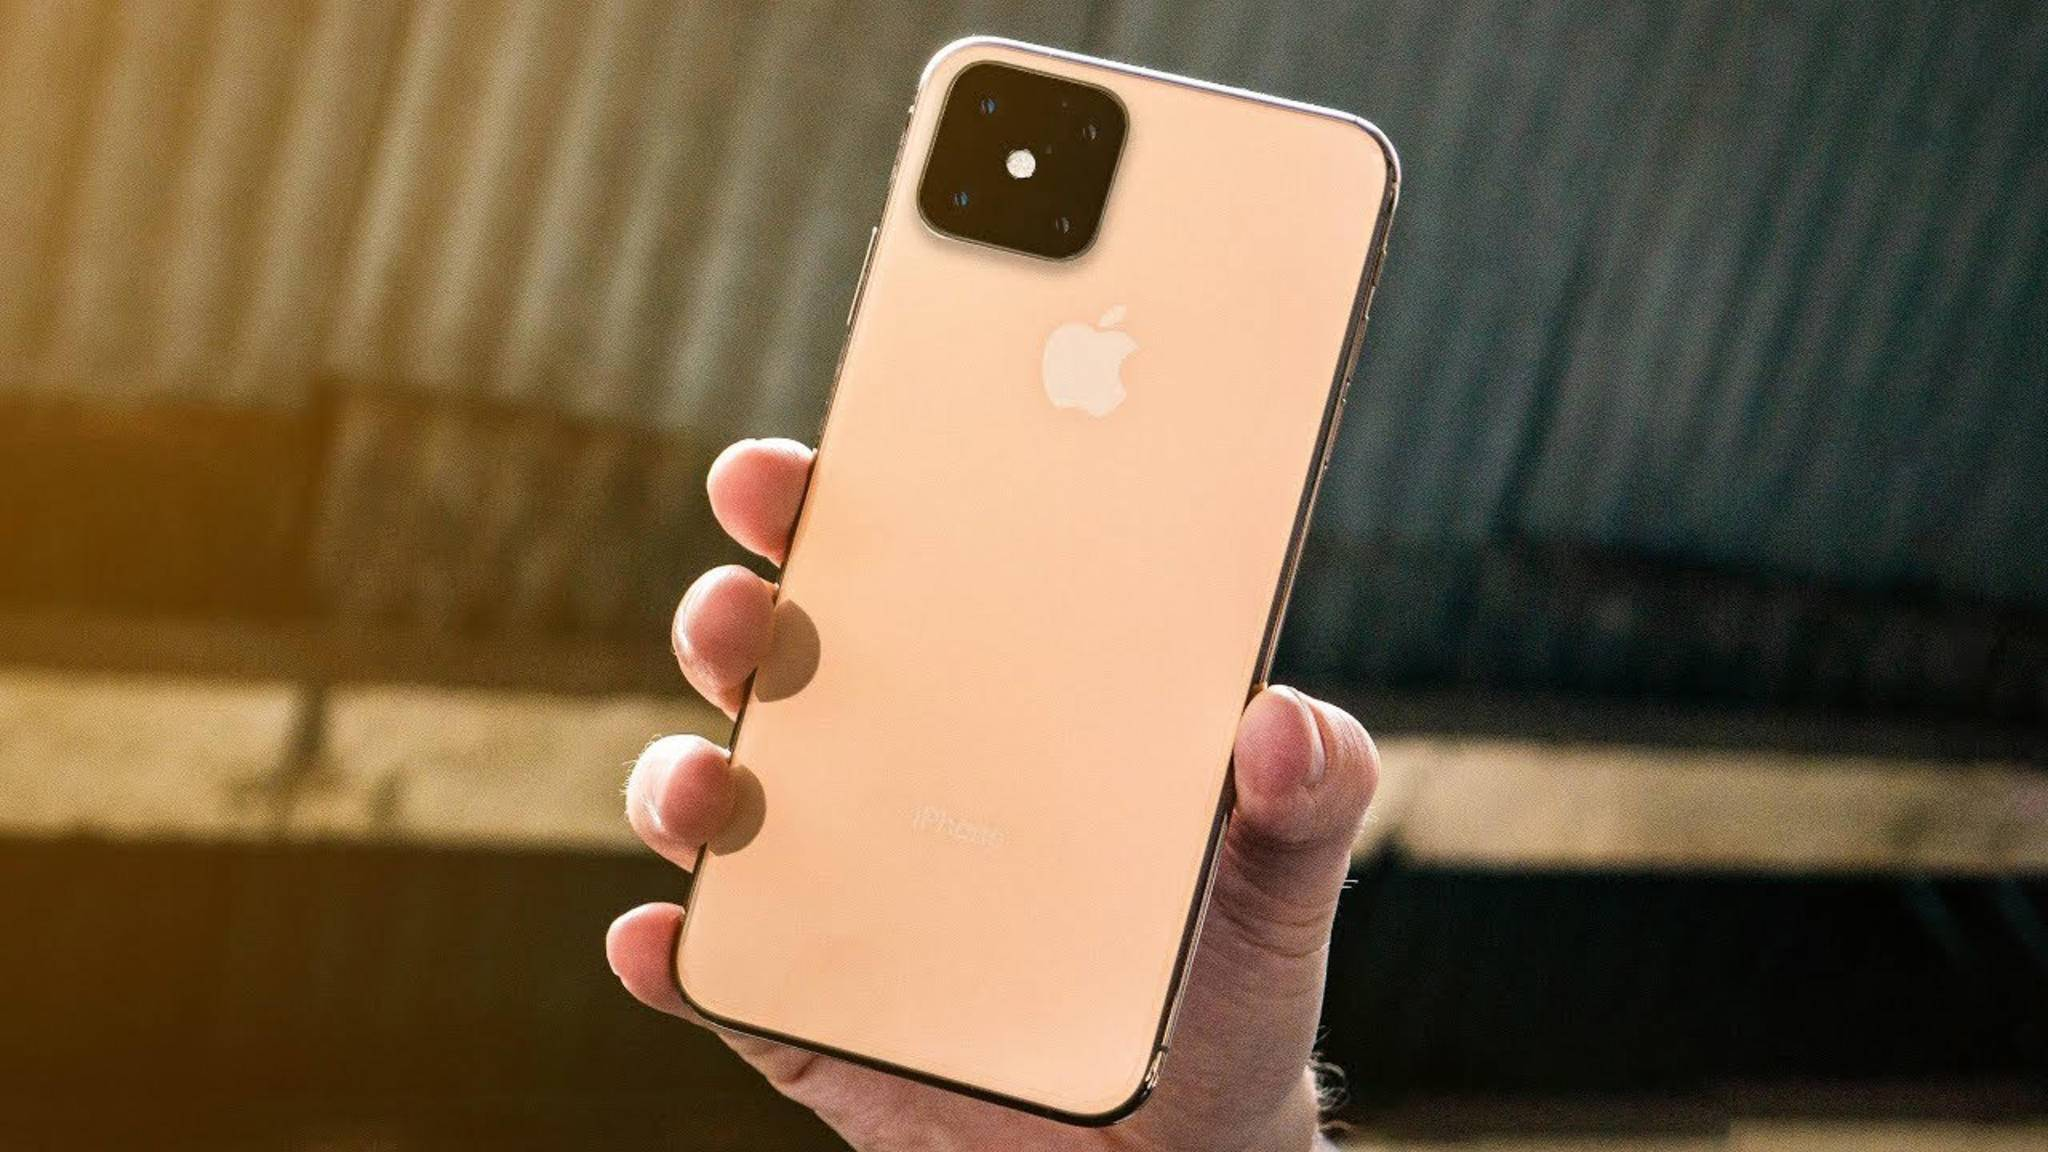 Wann wird Apple das iPhone 2019 tatsächlich enthüllen?